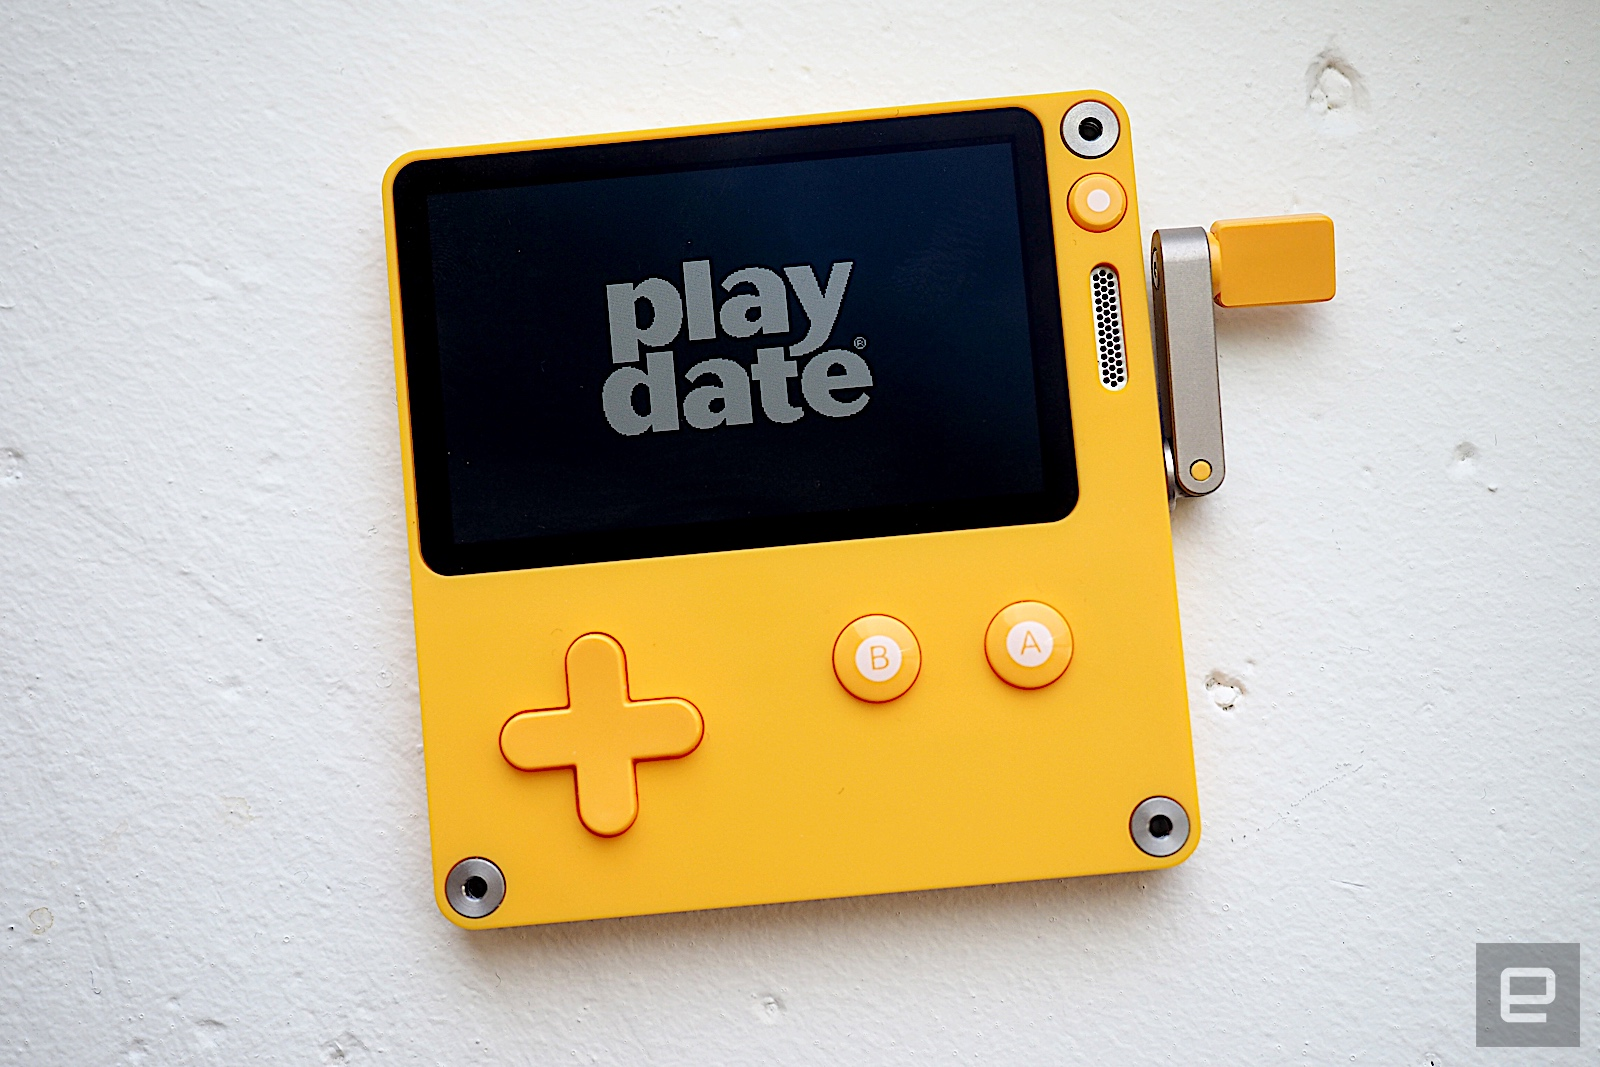 <p>Playdate</p>